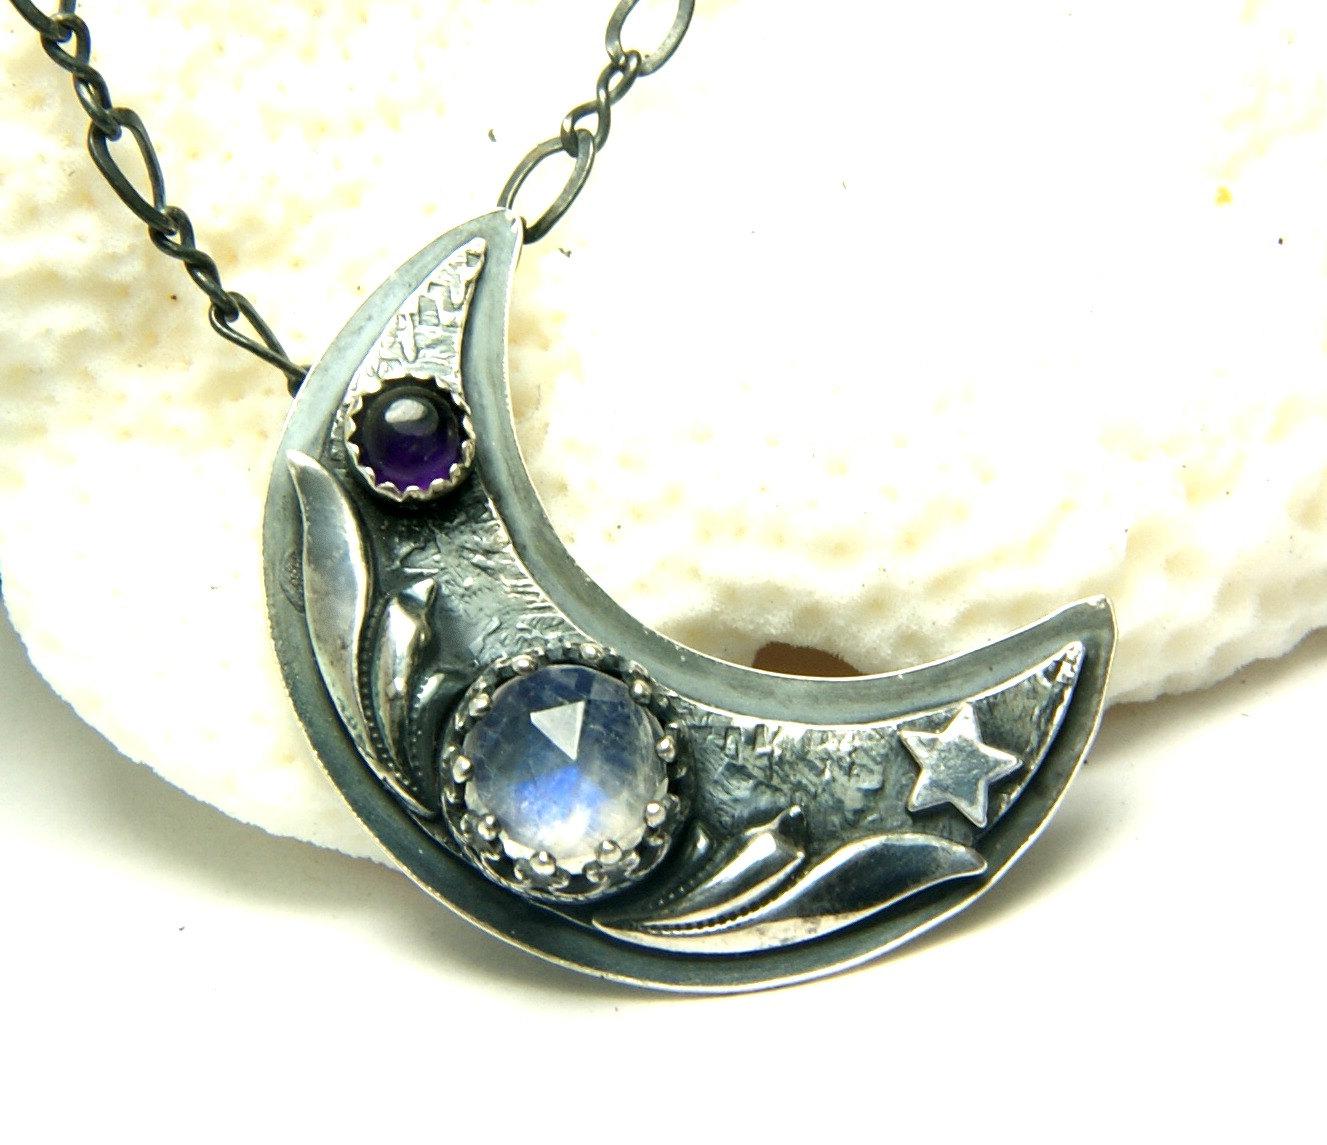 Moonstone Necklaces: Moonstone Necklace Crescent Moon Pendant Bohemian Jewelry